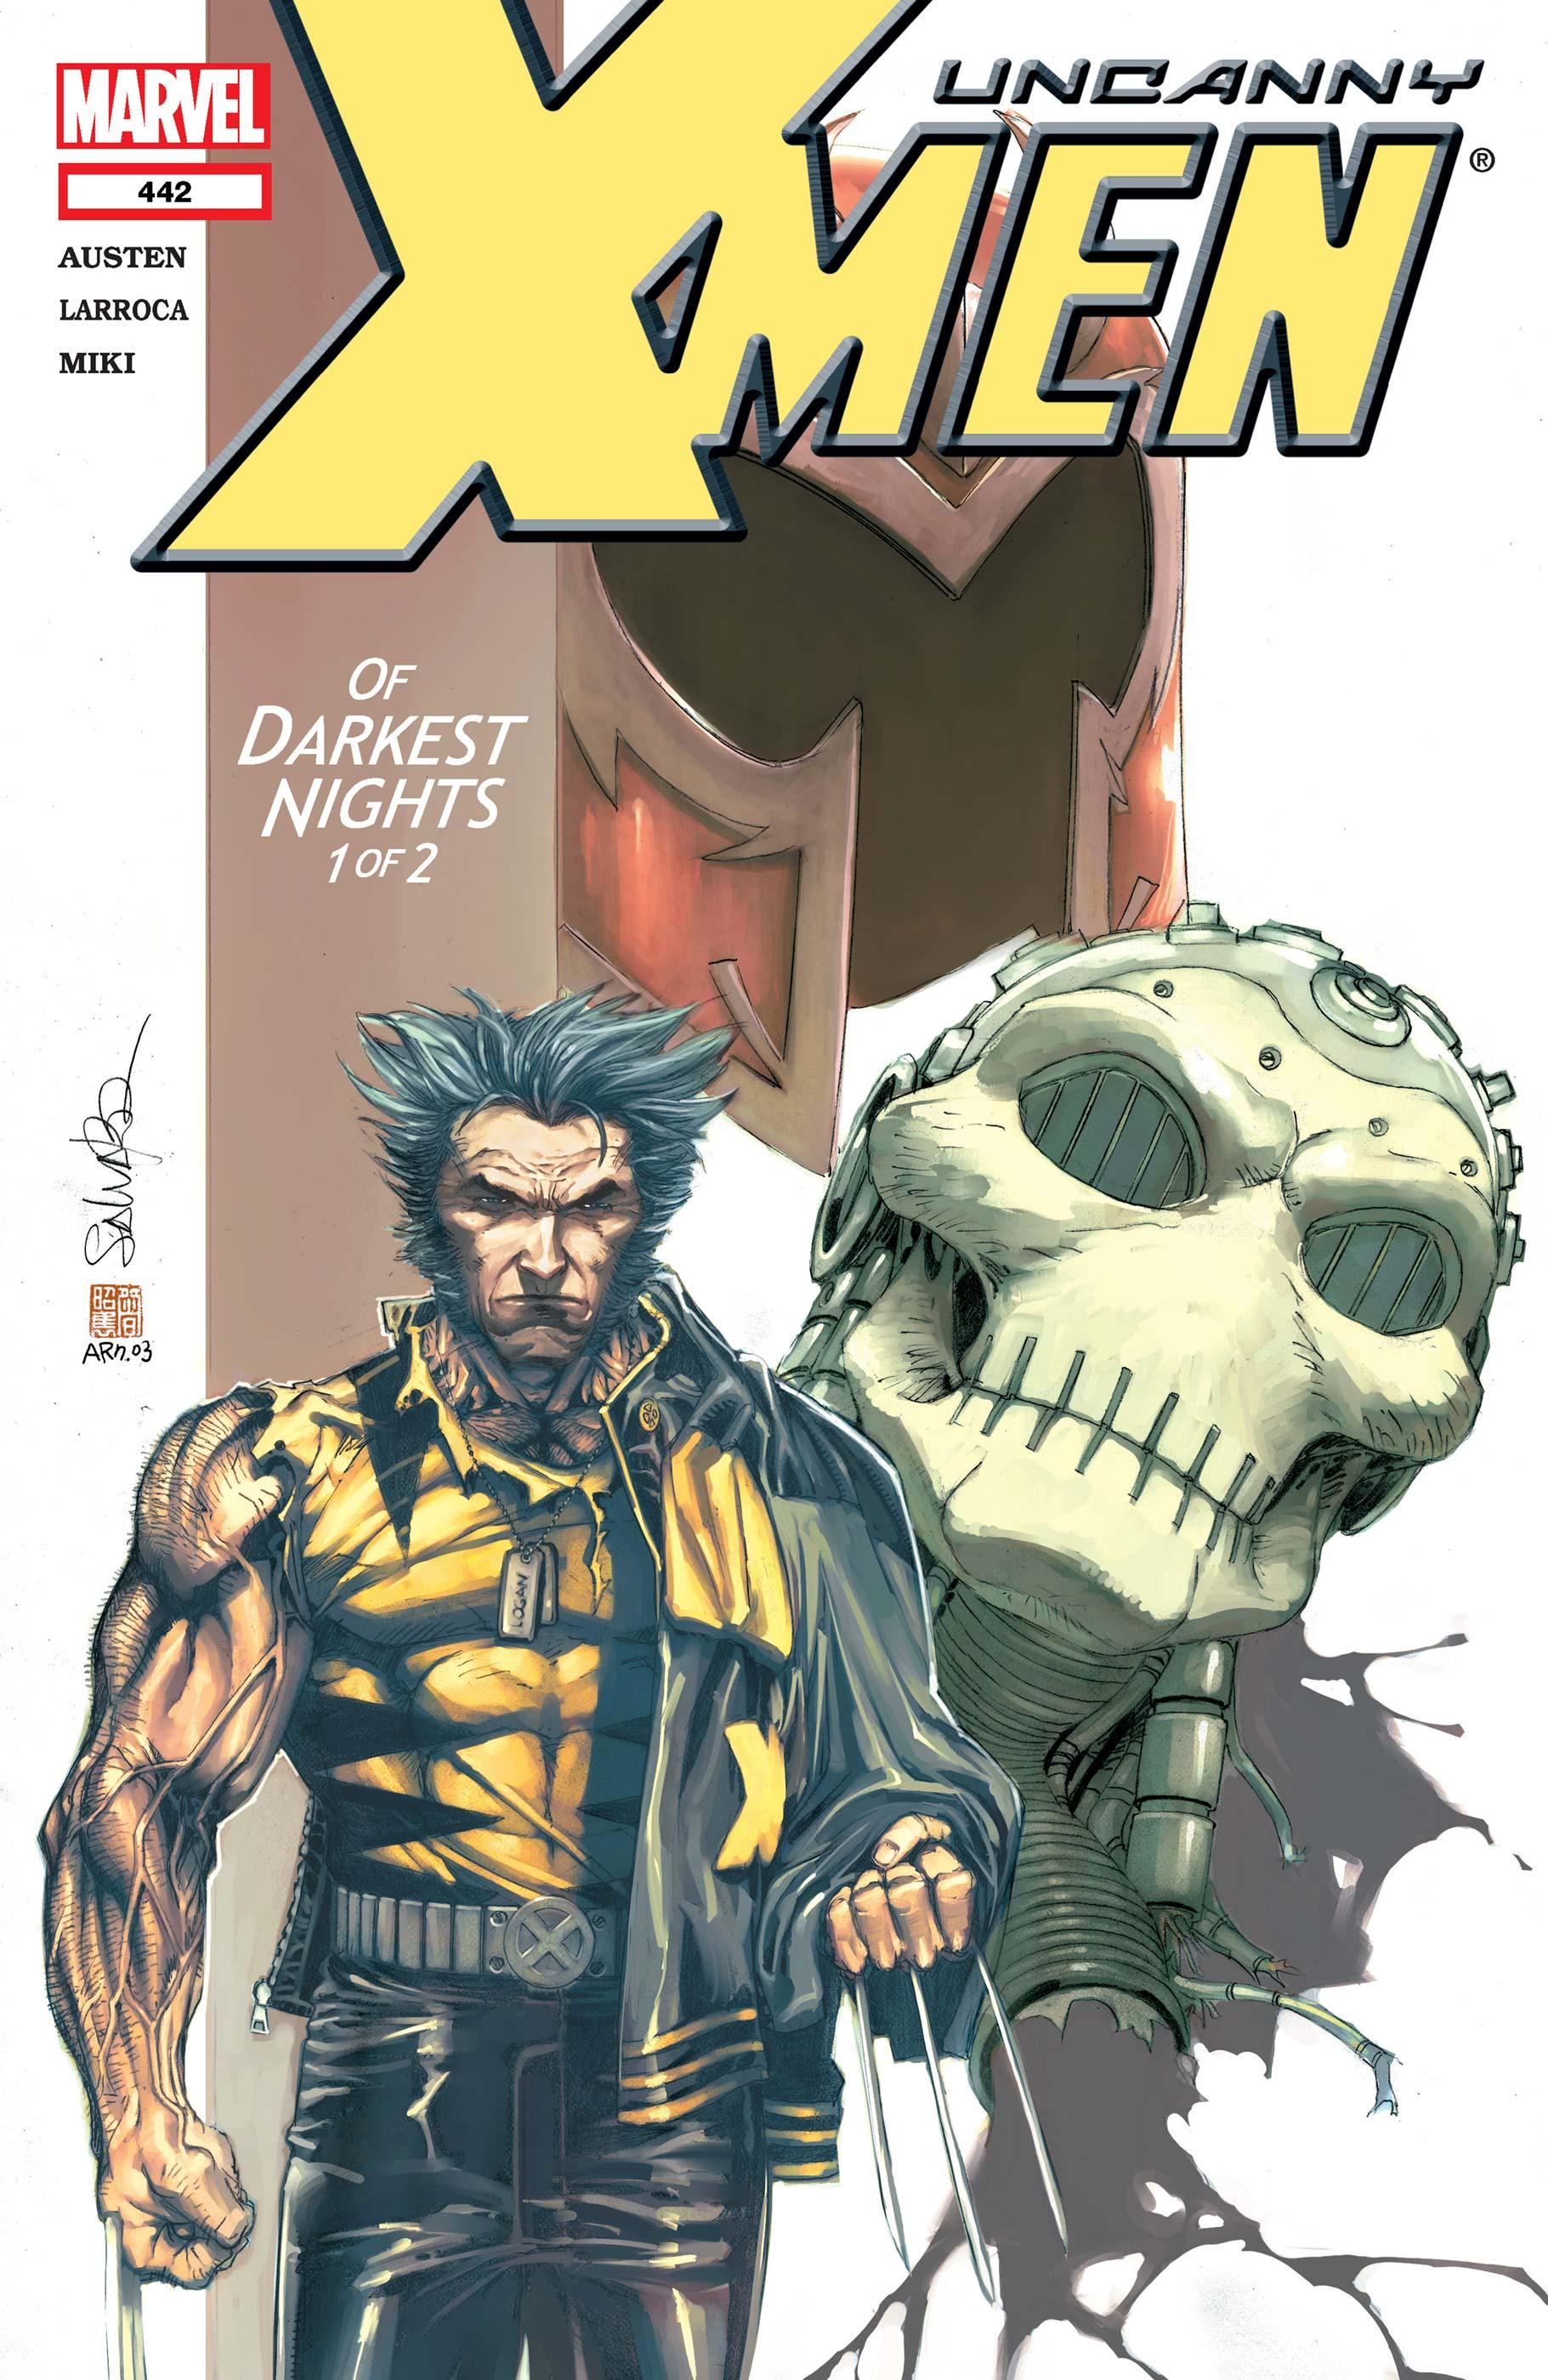 Uncanny X-Men (1963) #442